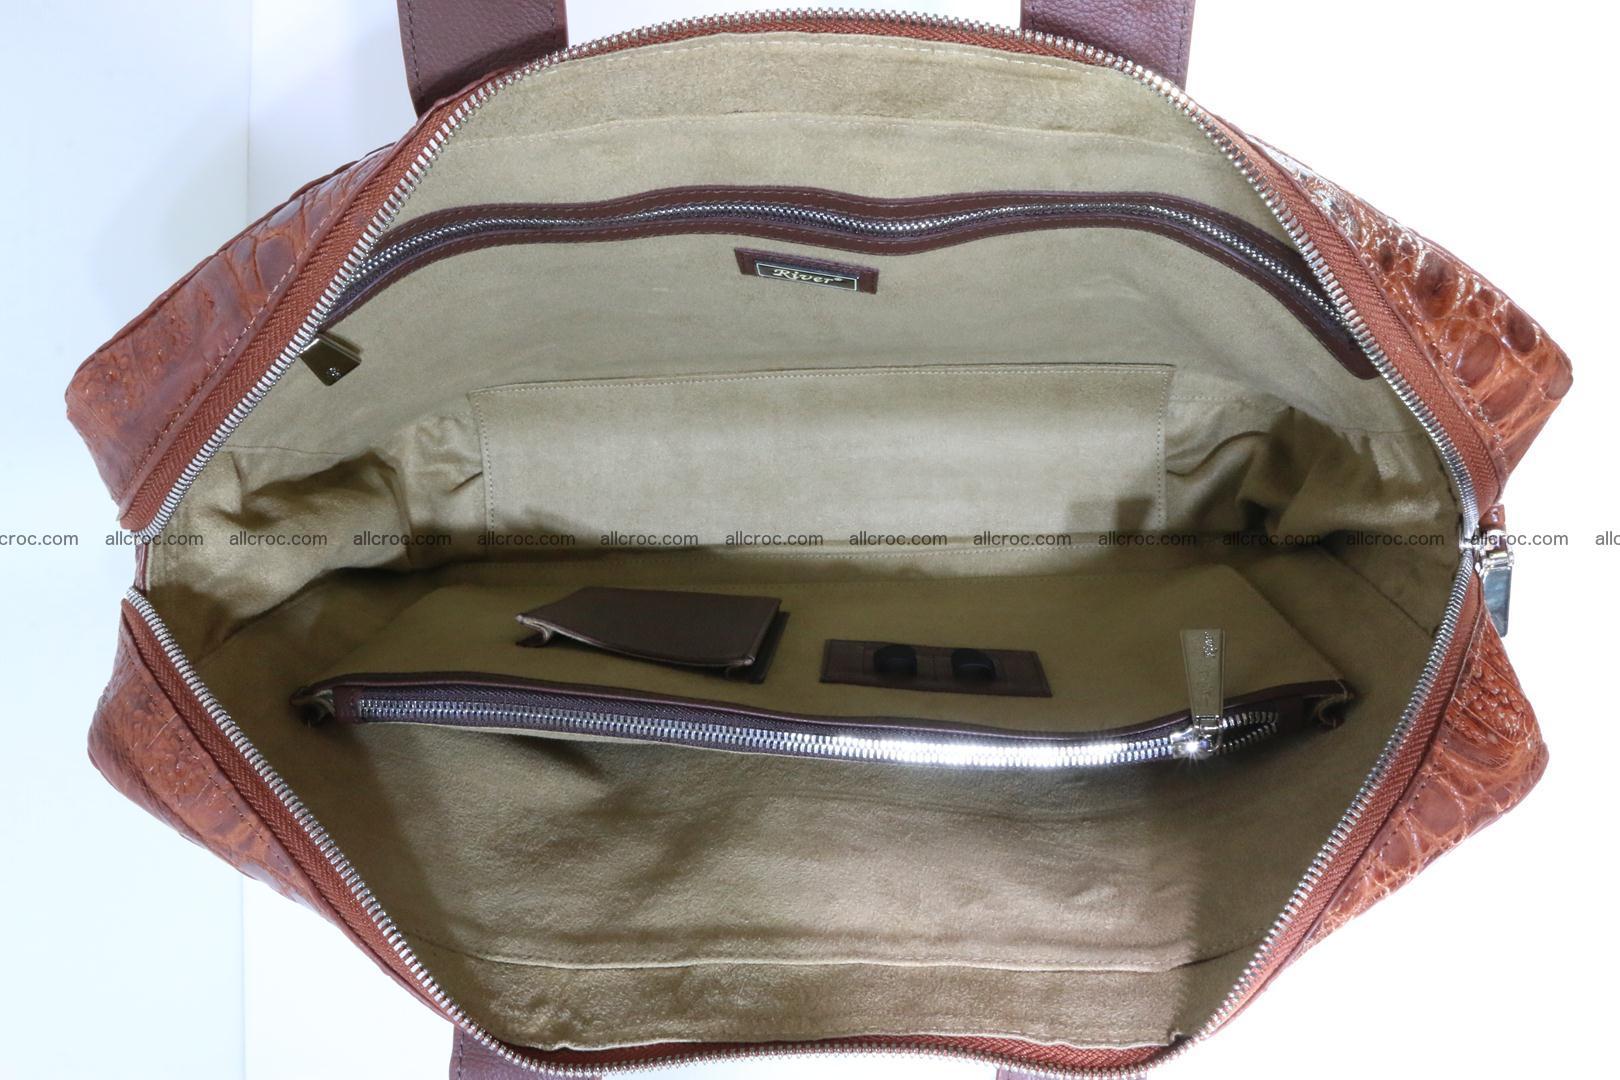 Crocodile skin handbag 125 Foto 12